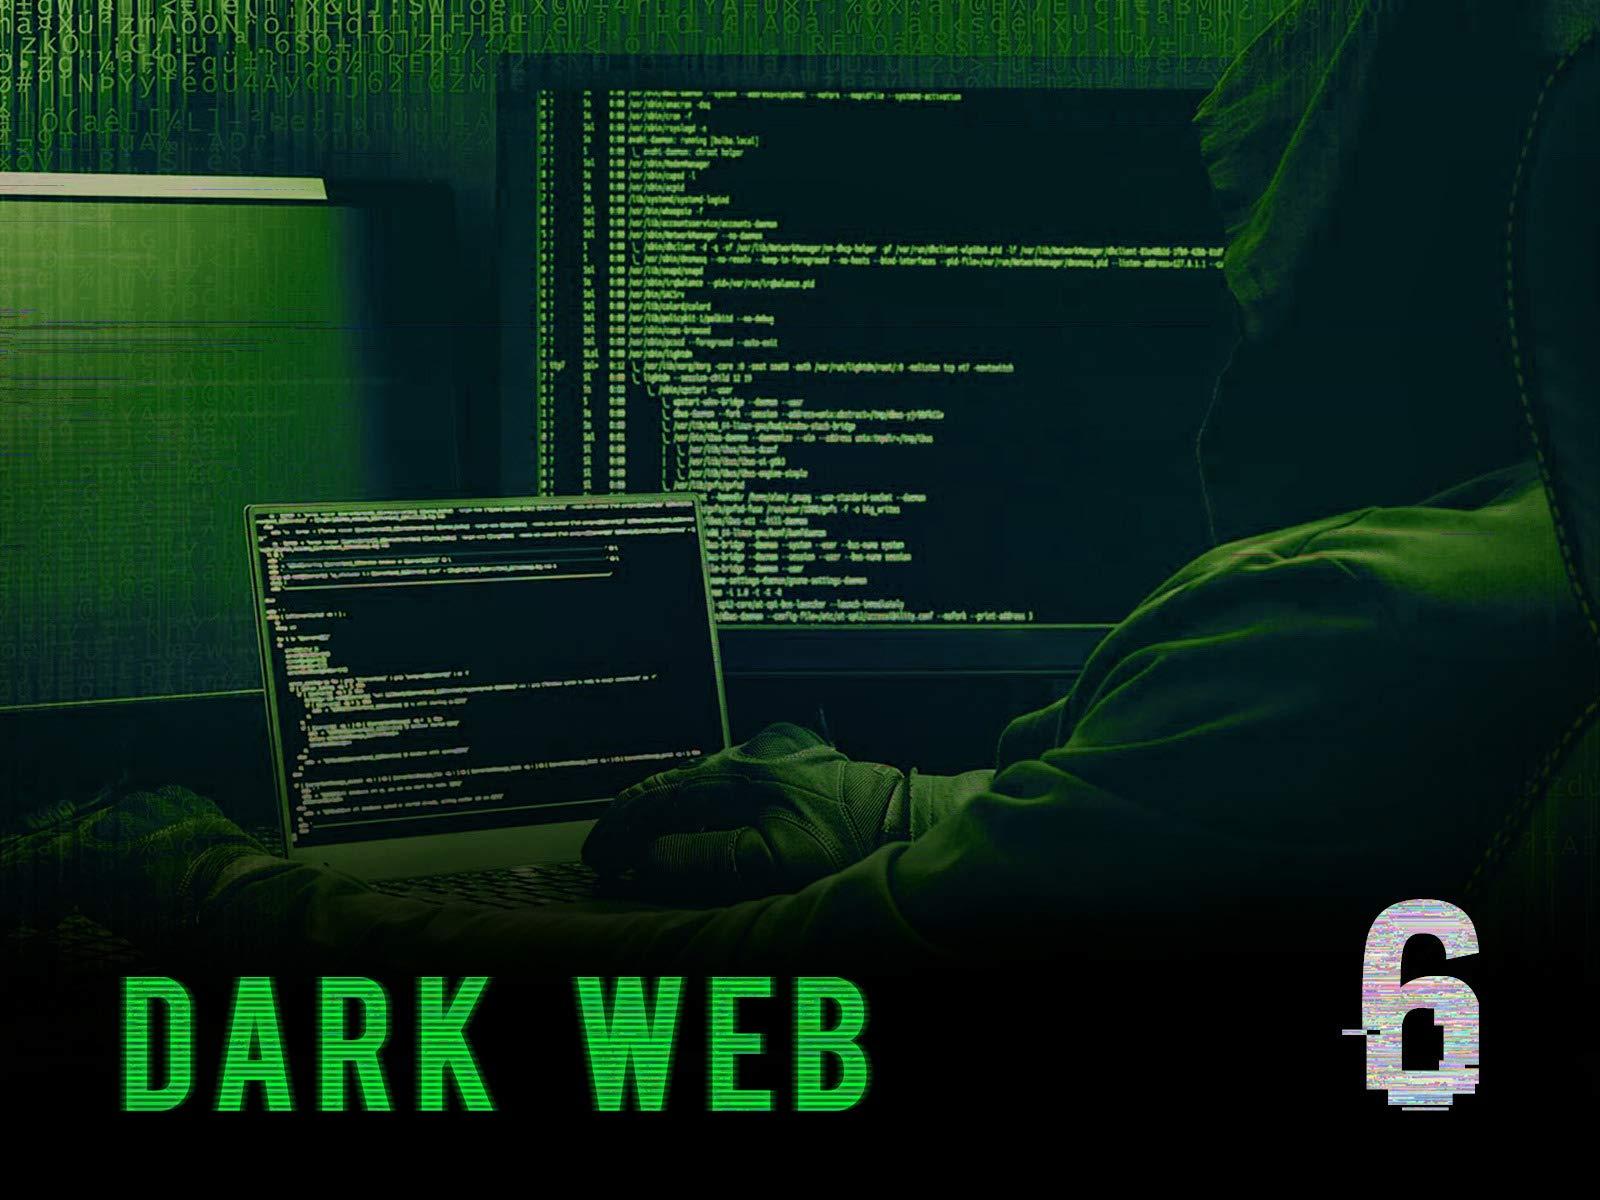 Watch Dark Web Prime Video